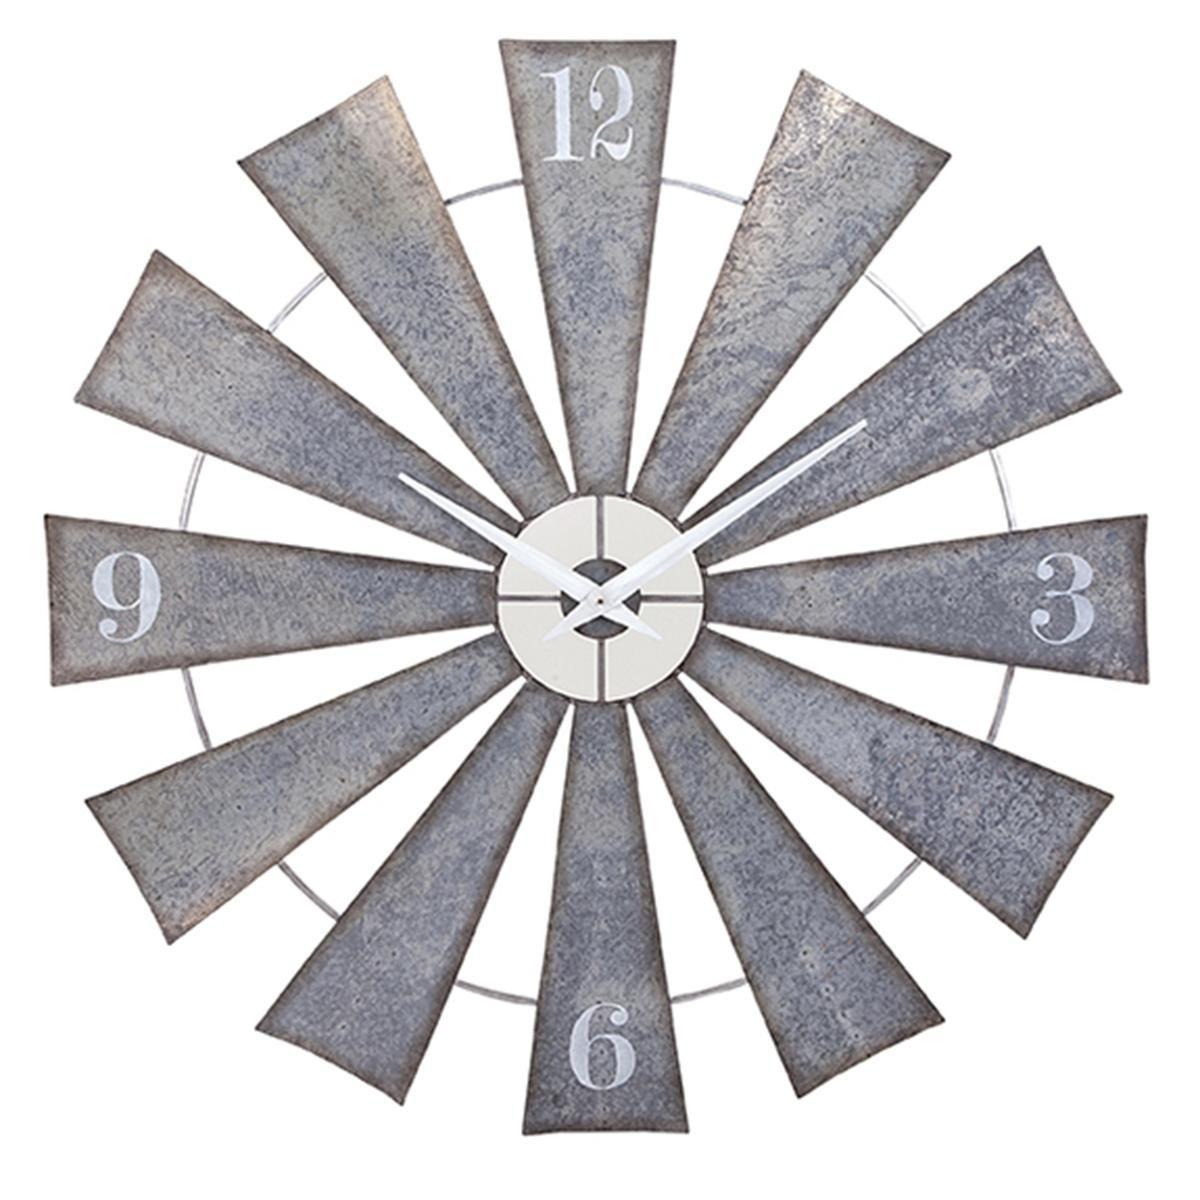 metal windmill wall clock also decor  farm house fixer upper rh pinterest